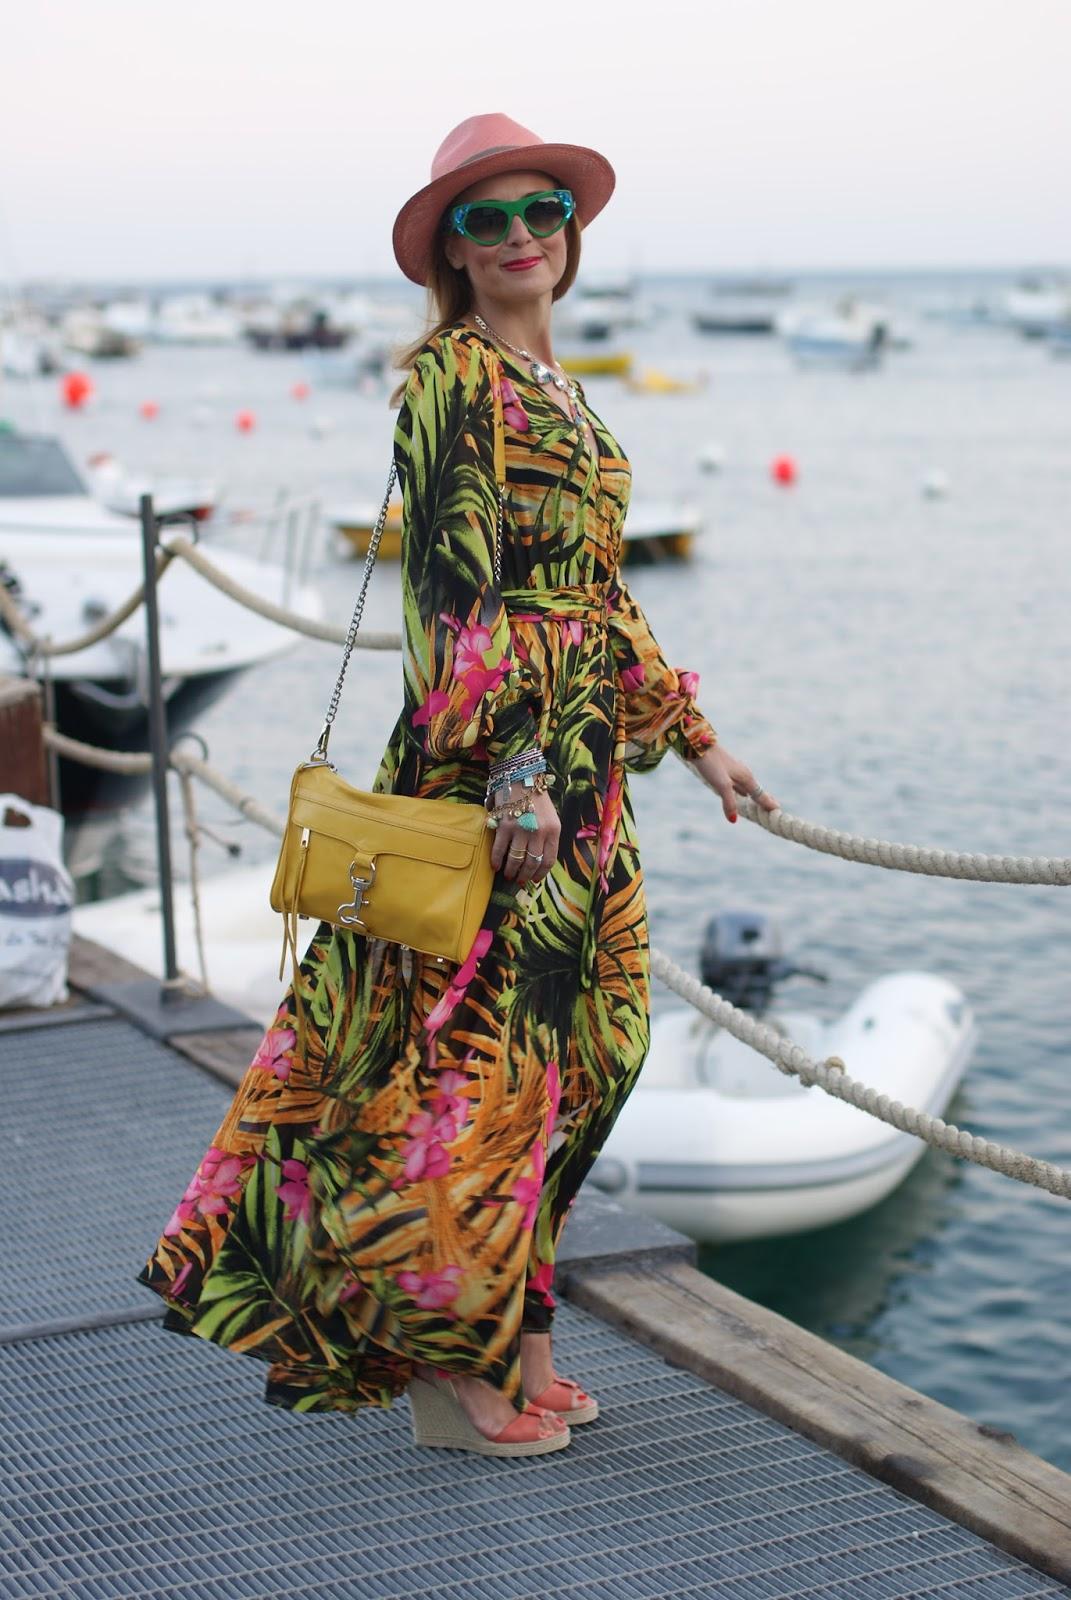 amalfi coast style with a tropical print chiffon maxi dress, ecua-andino hat for a summer boho style on Fashion and Cookies fashion blog, fashion blogger style